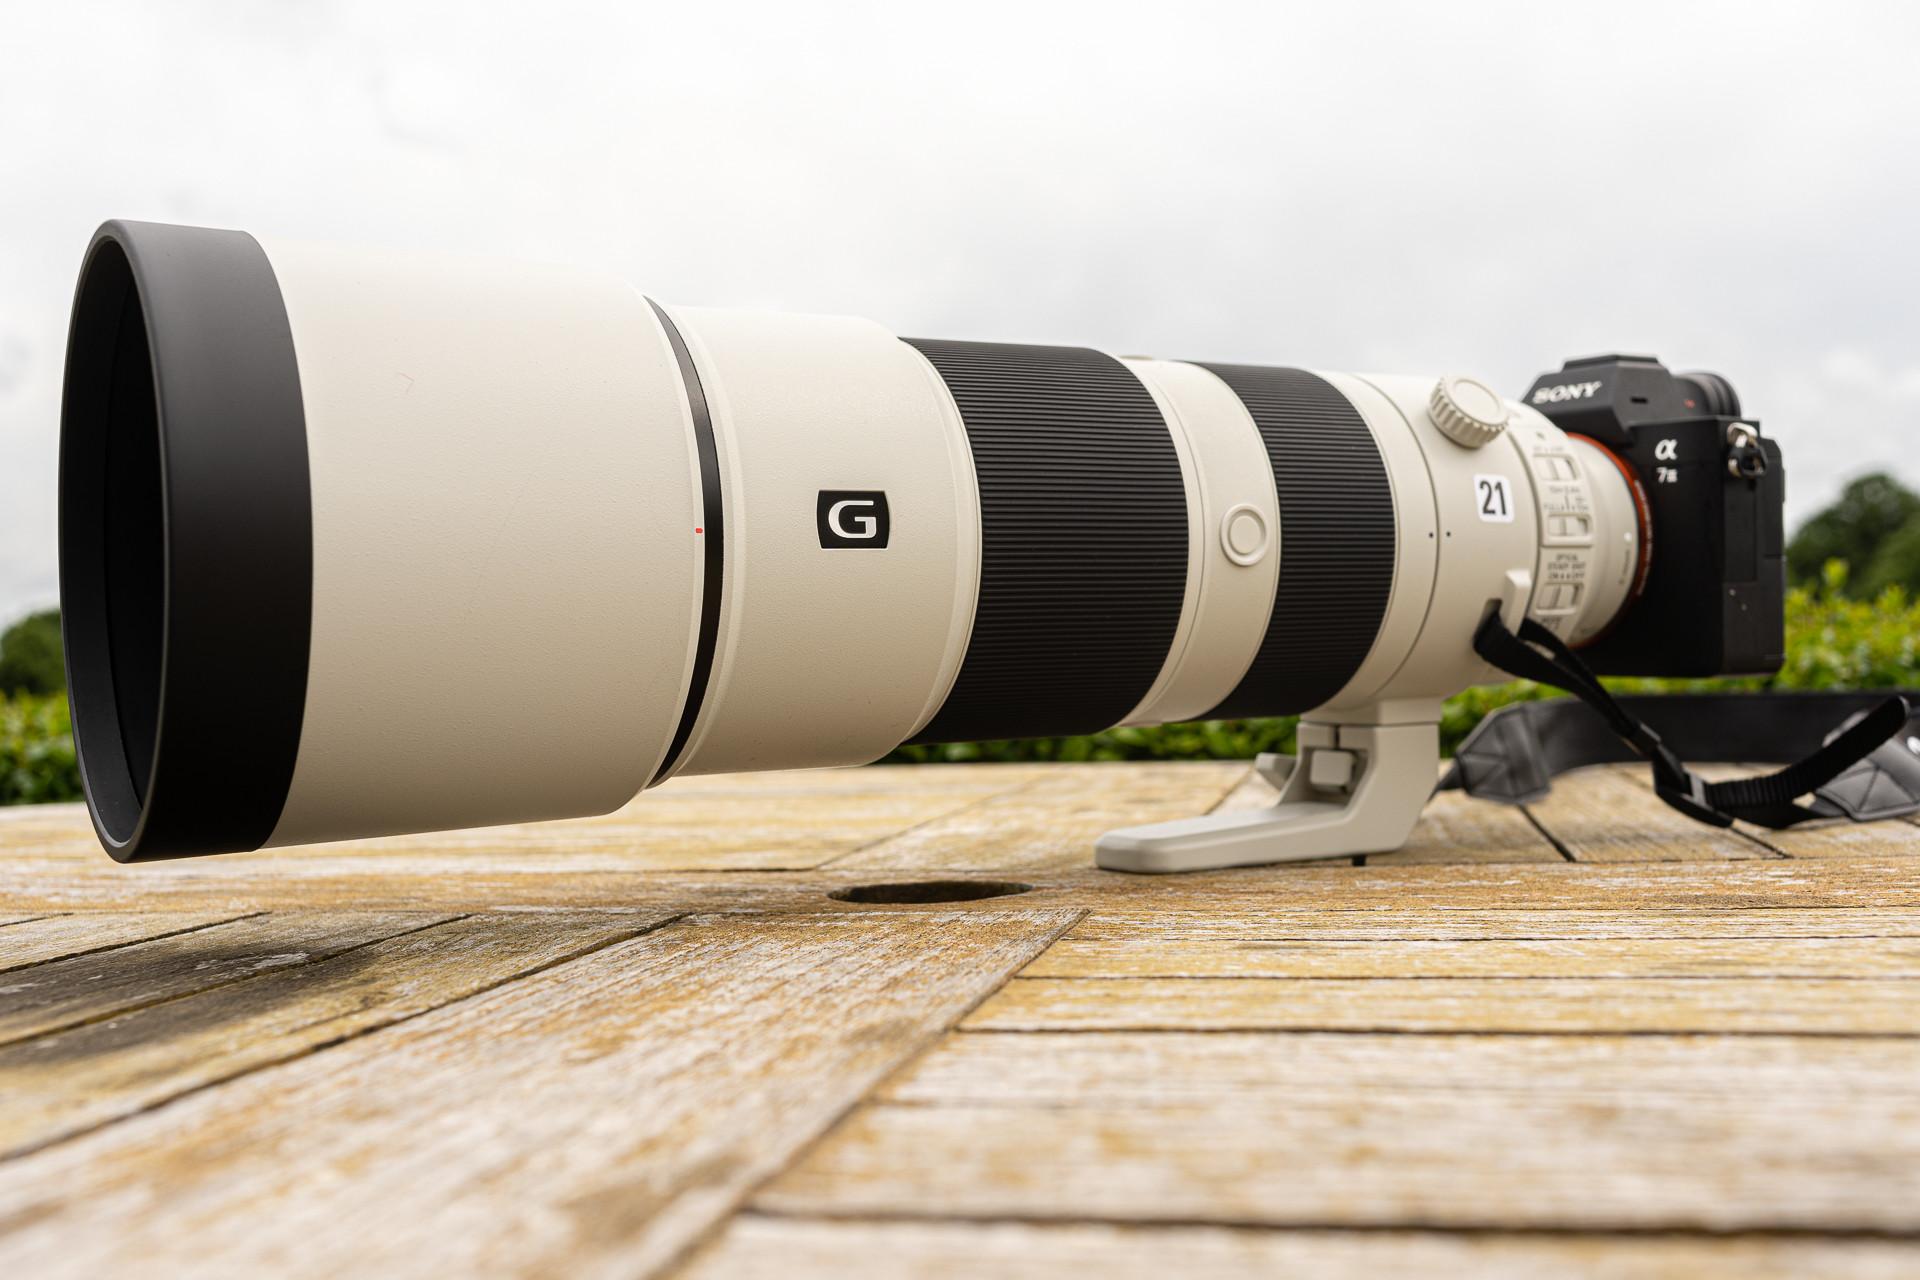 Foto de FE 600mm F4 GM OSS y el FE 200-600mm F5.6-6.3 G OSS (2/27)